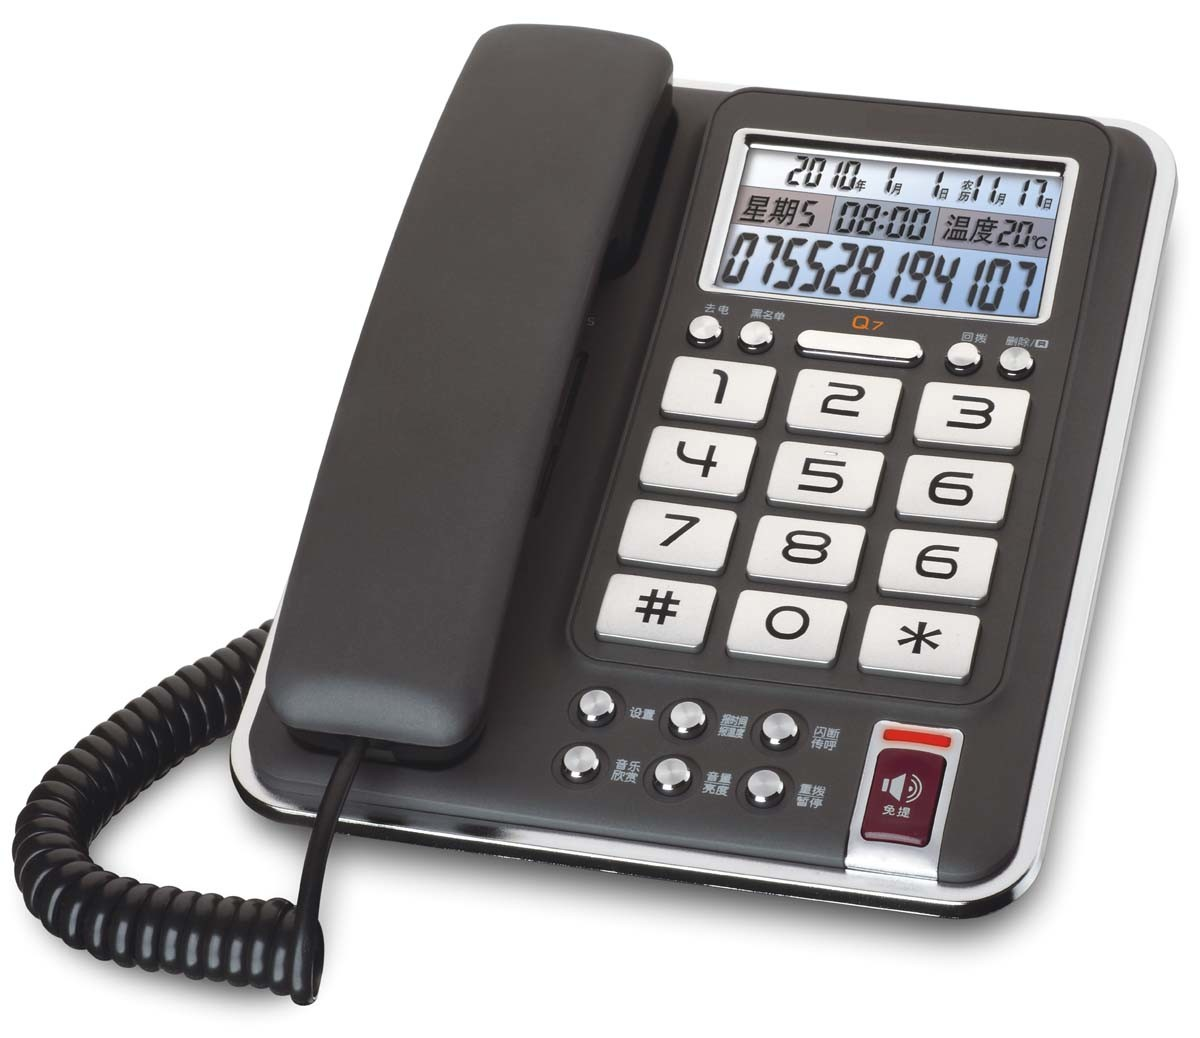 Big Button, Speaker Phone, Caller ID Telephone